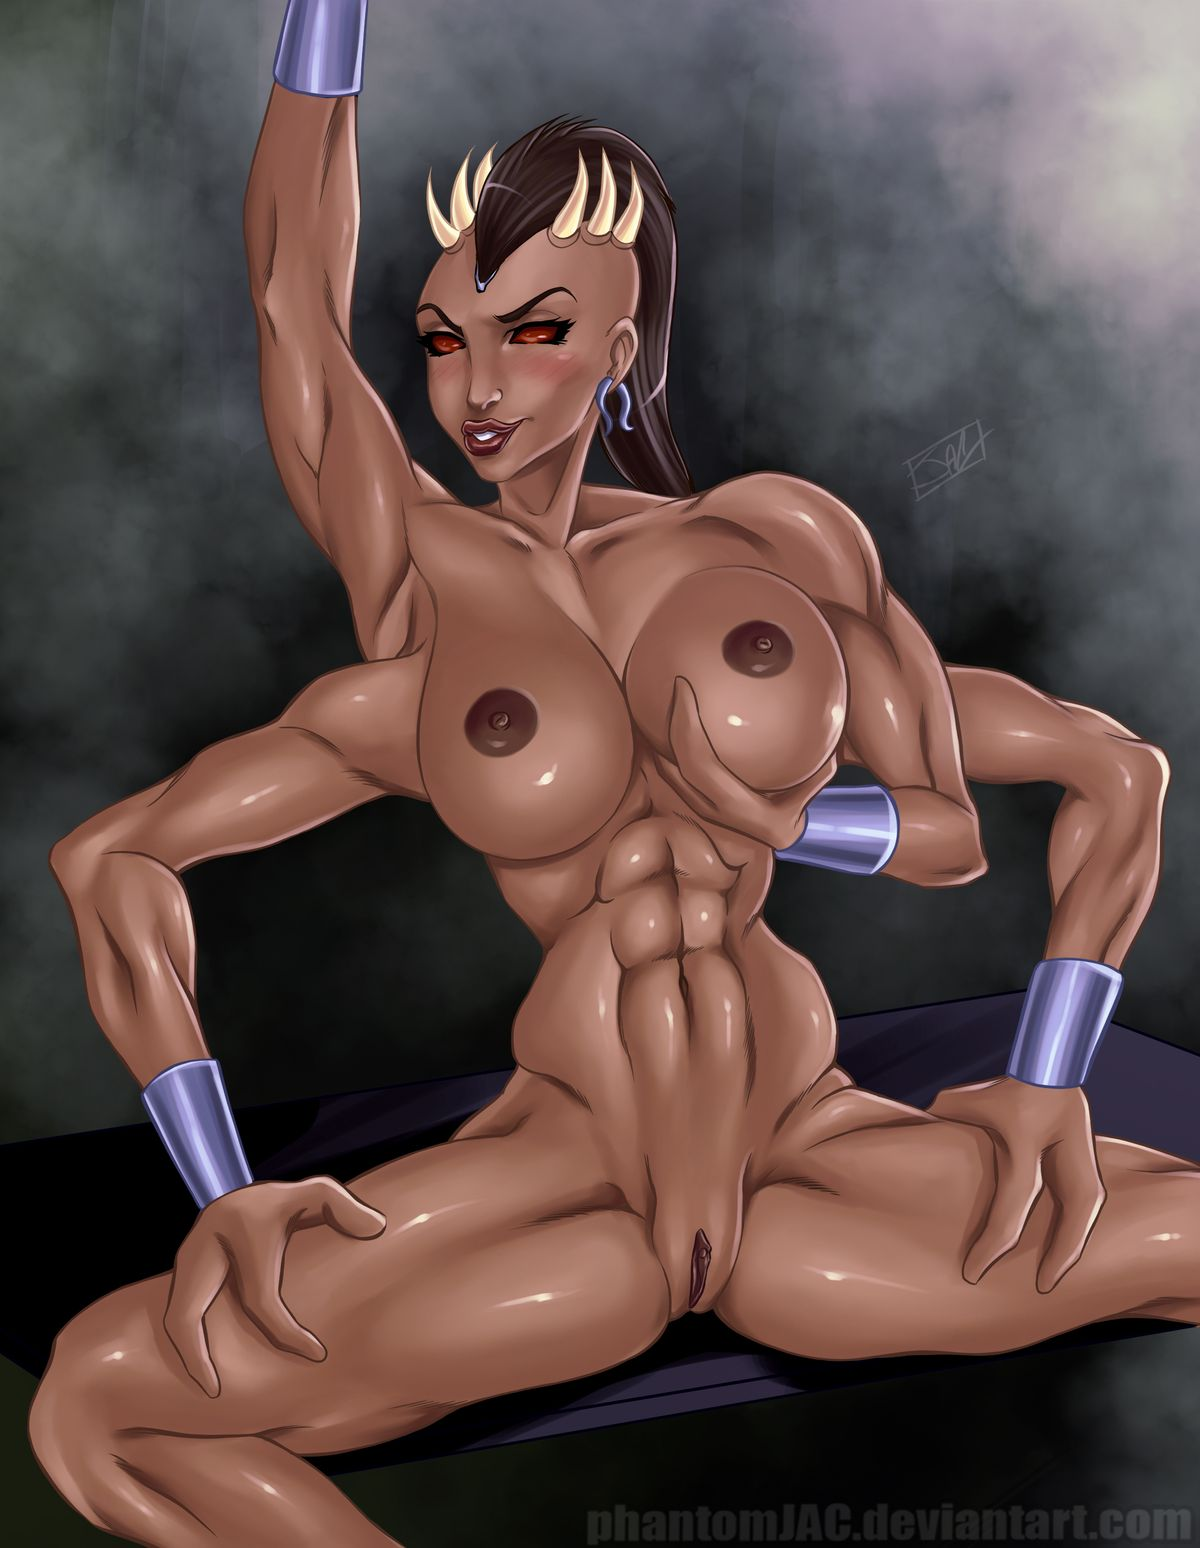 Sheva mk hentai lesbian pics erotic images